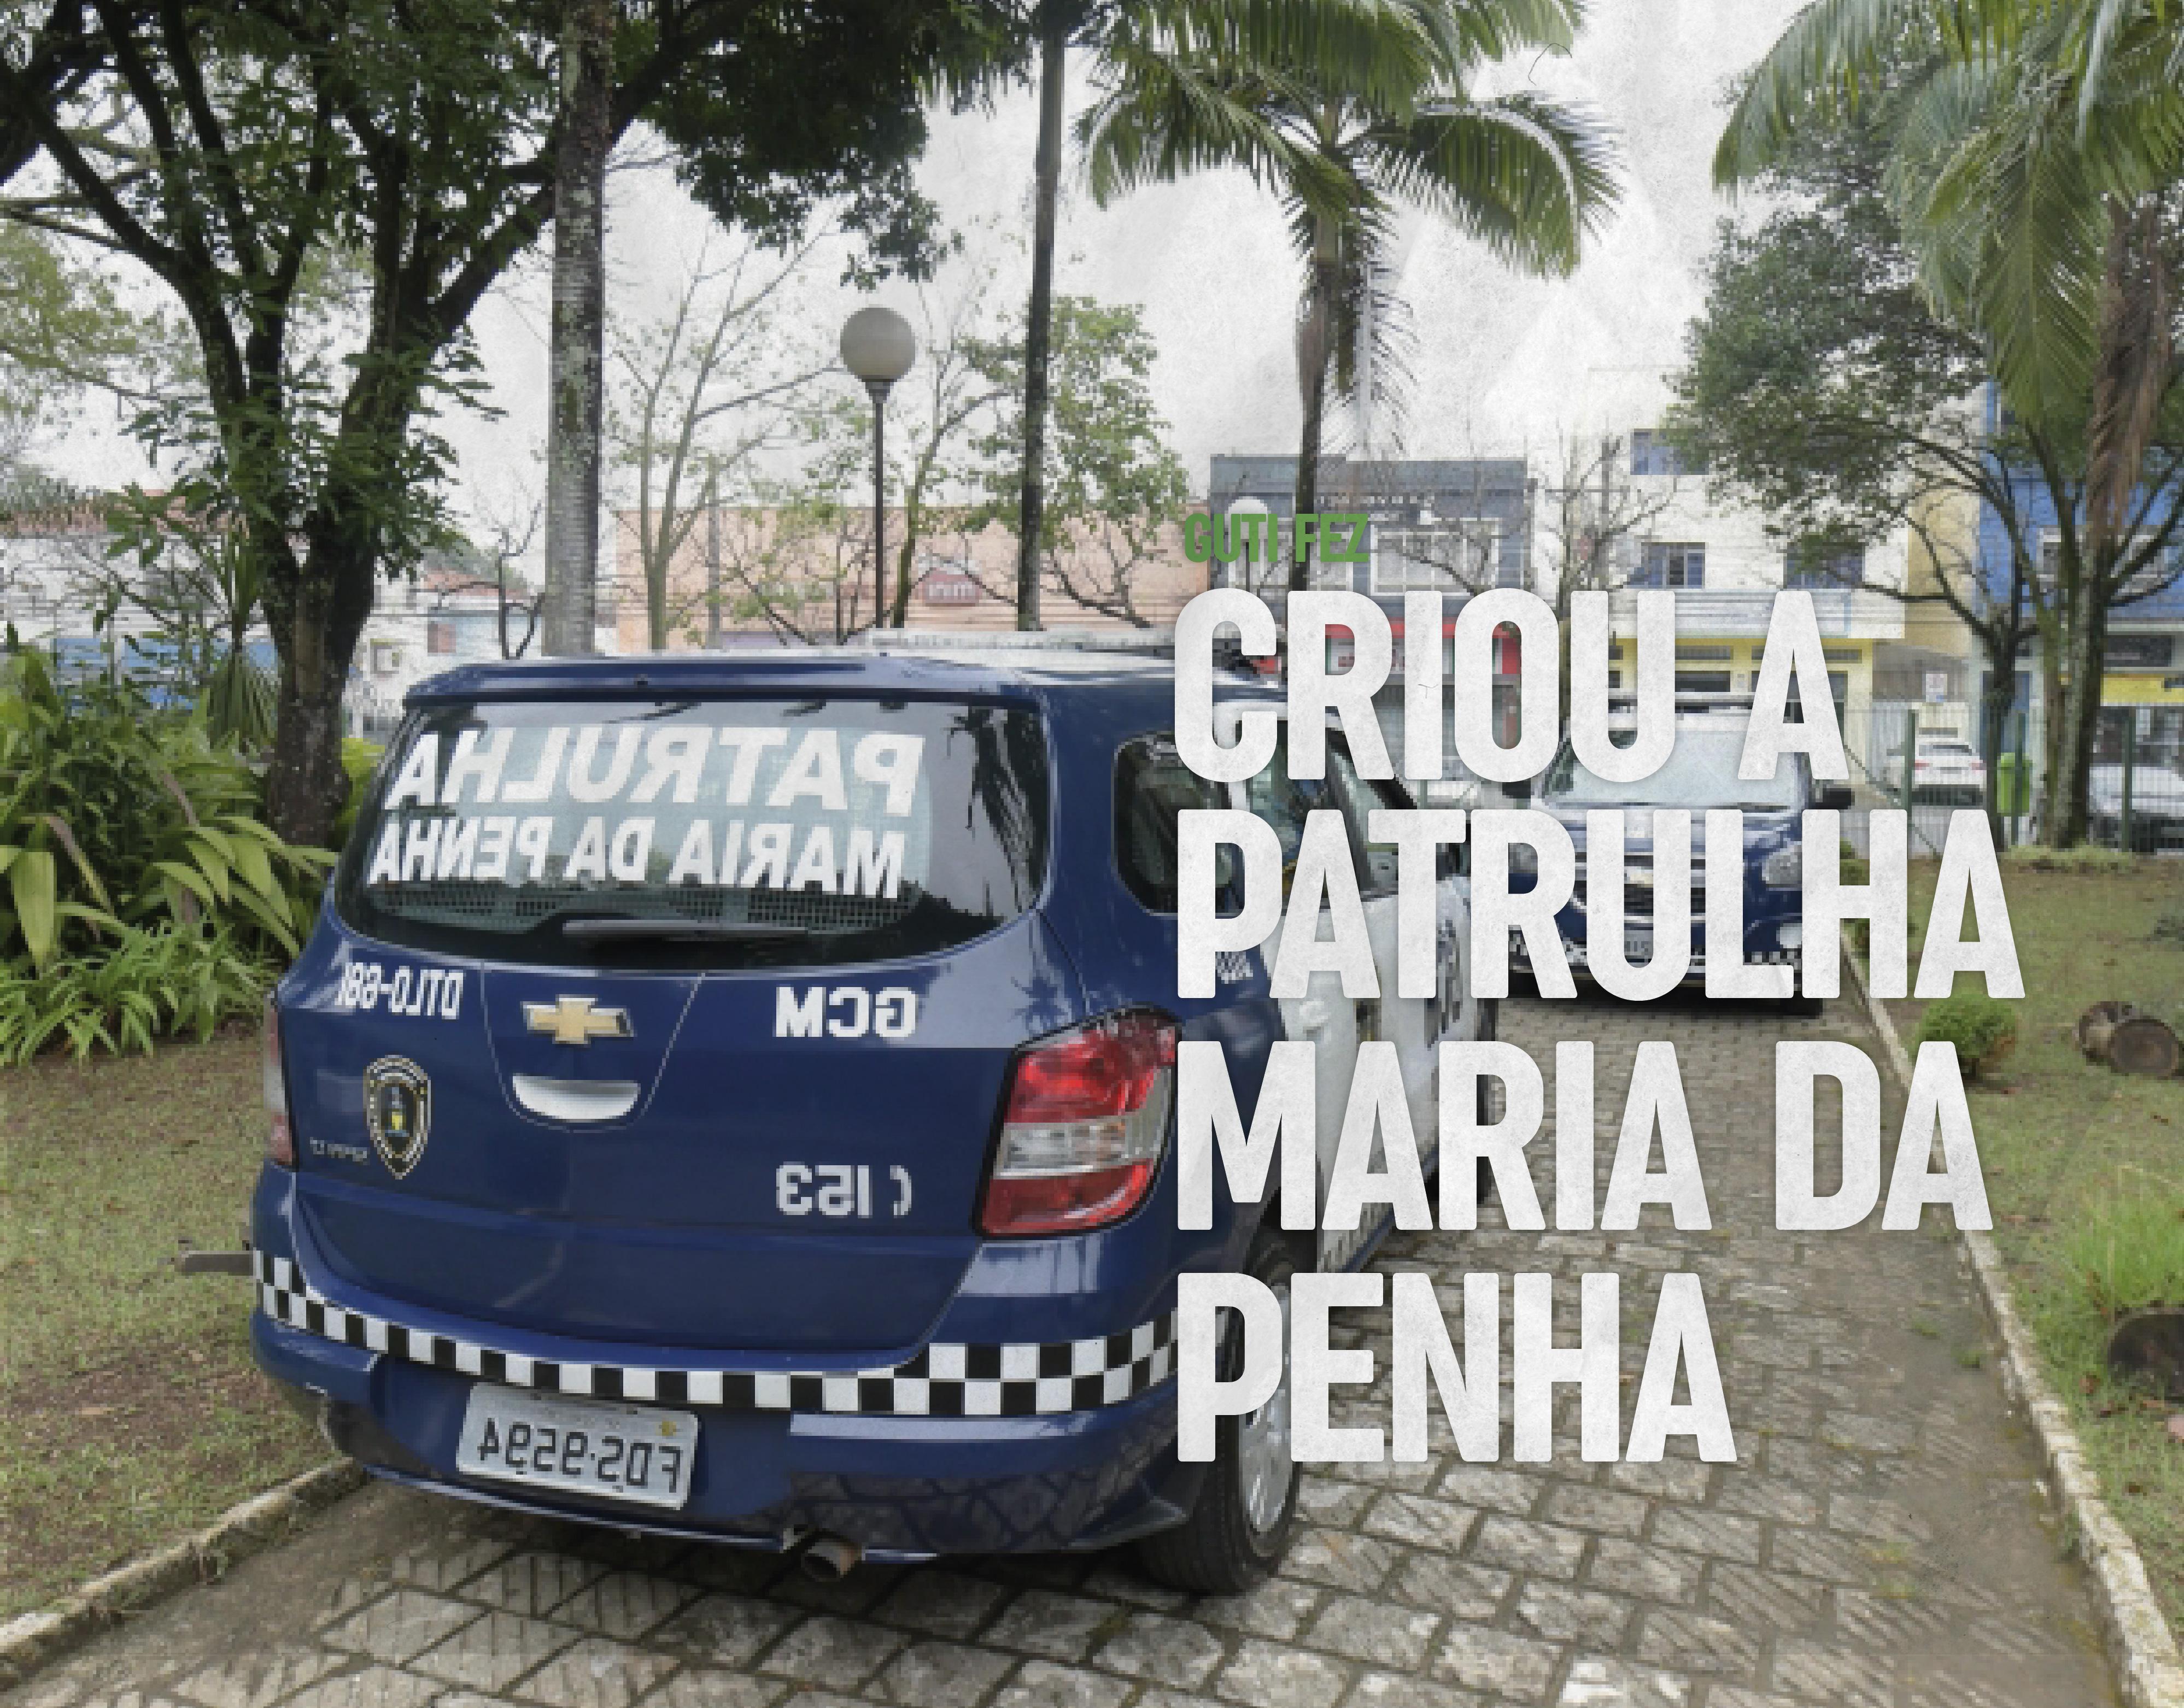 Criou a patrulha Maria da Penha